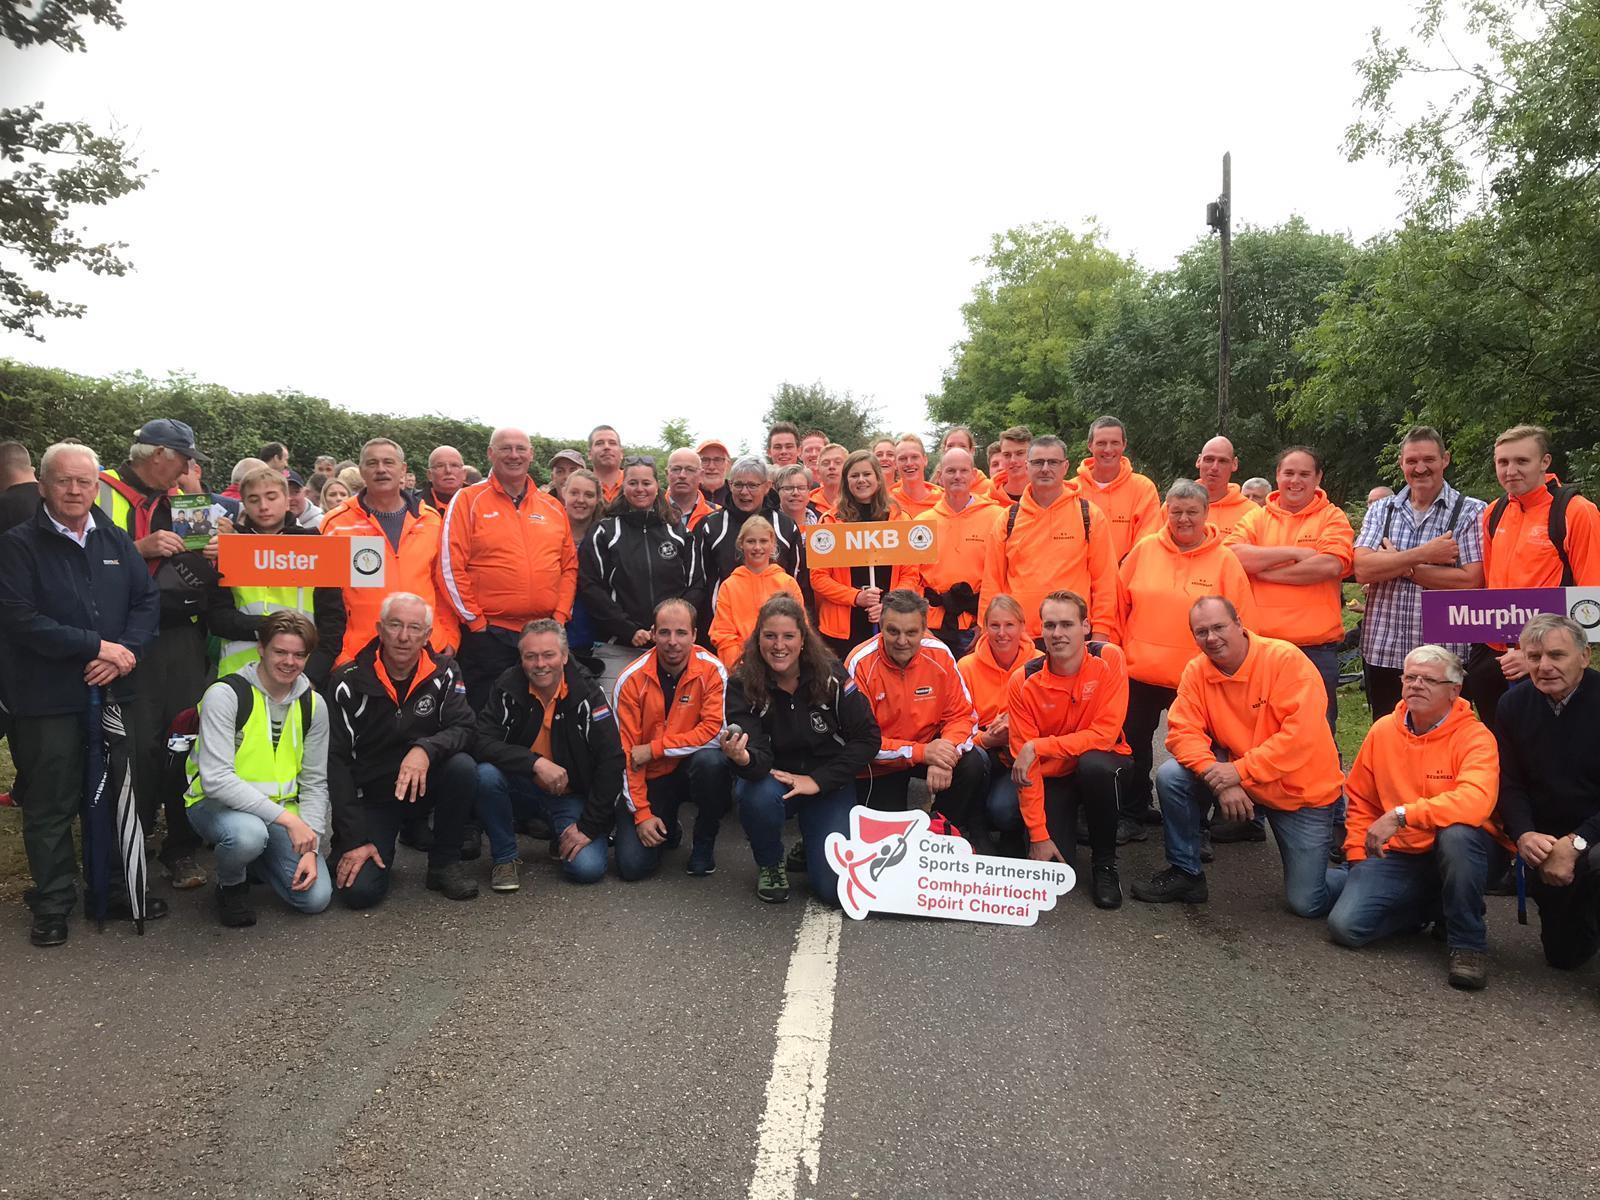 Nederlands team beleeft spannende wedstrijden in Ierland